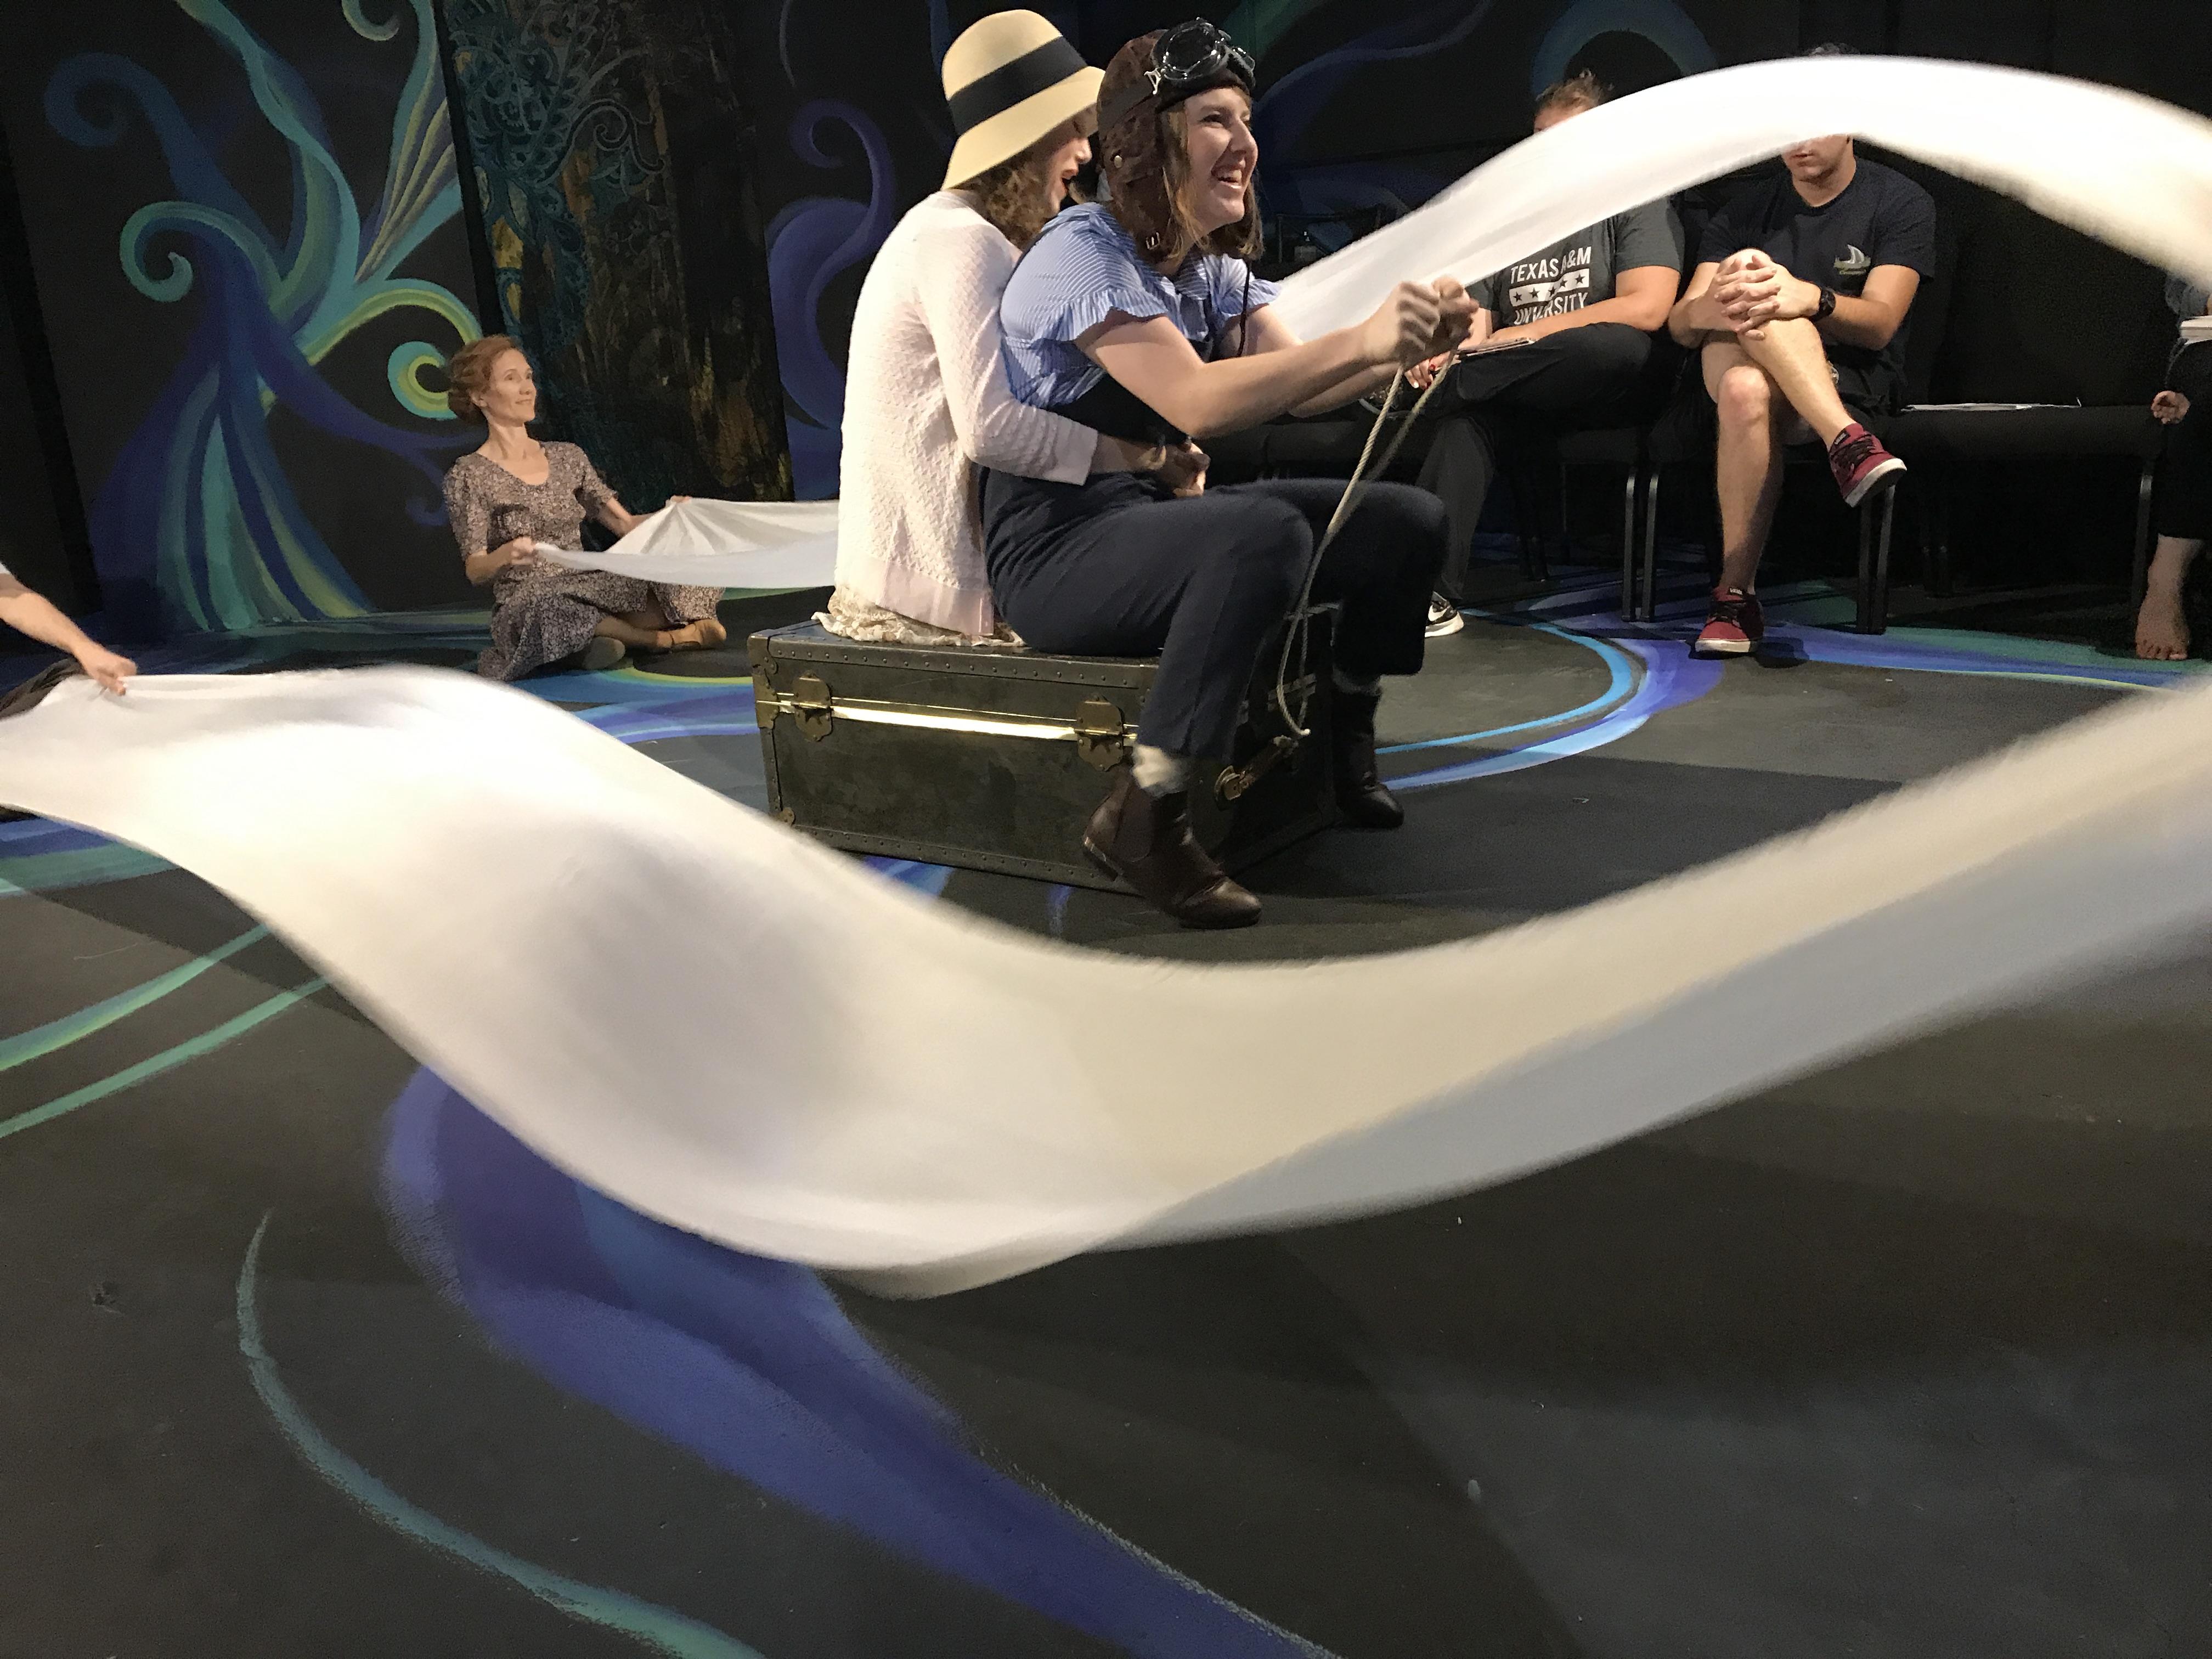 Iro and Annika flying Pegasus